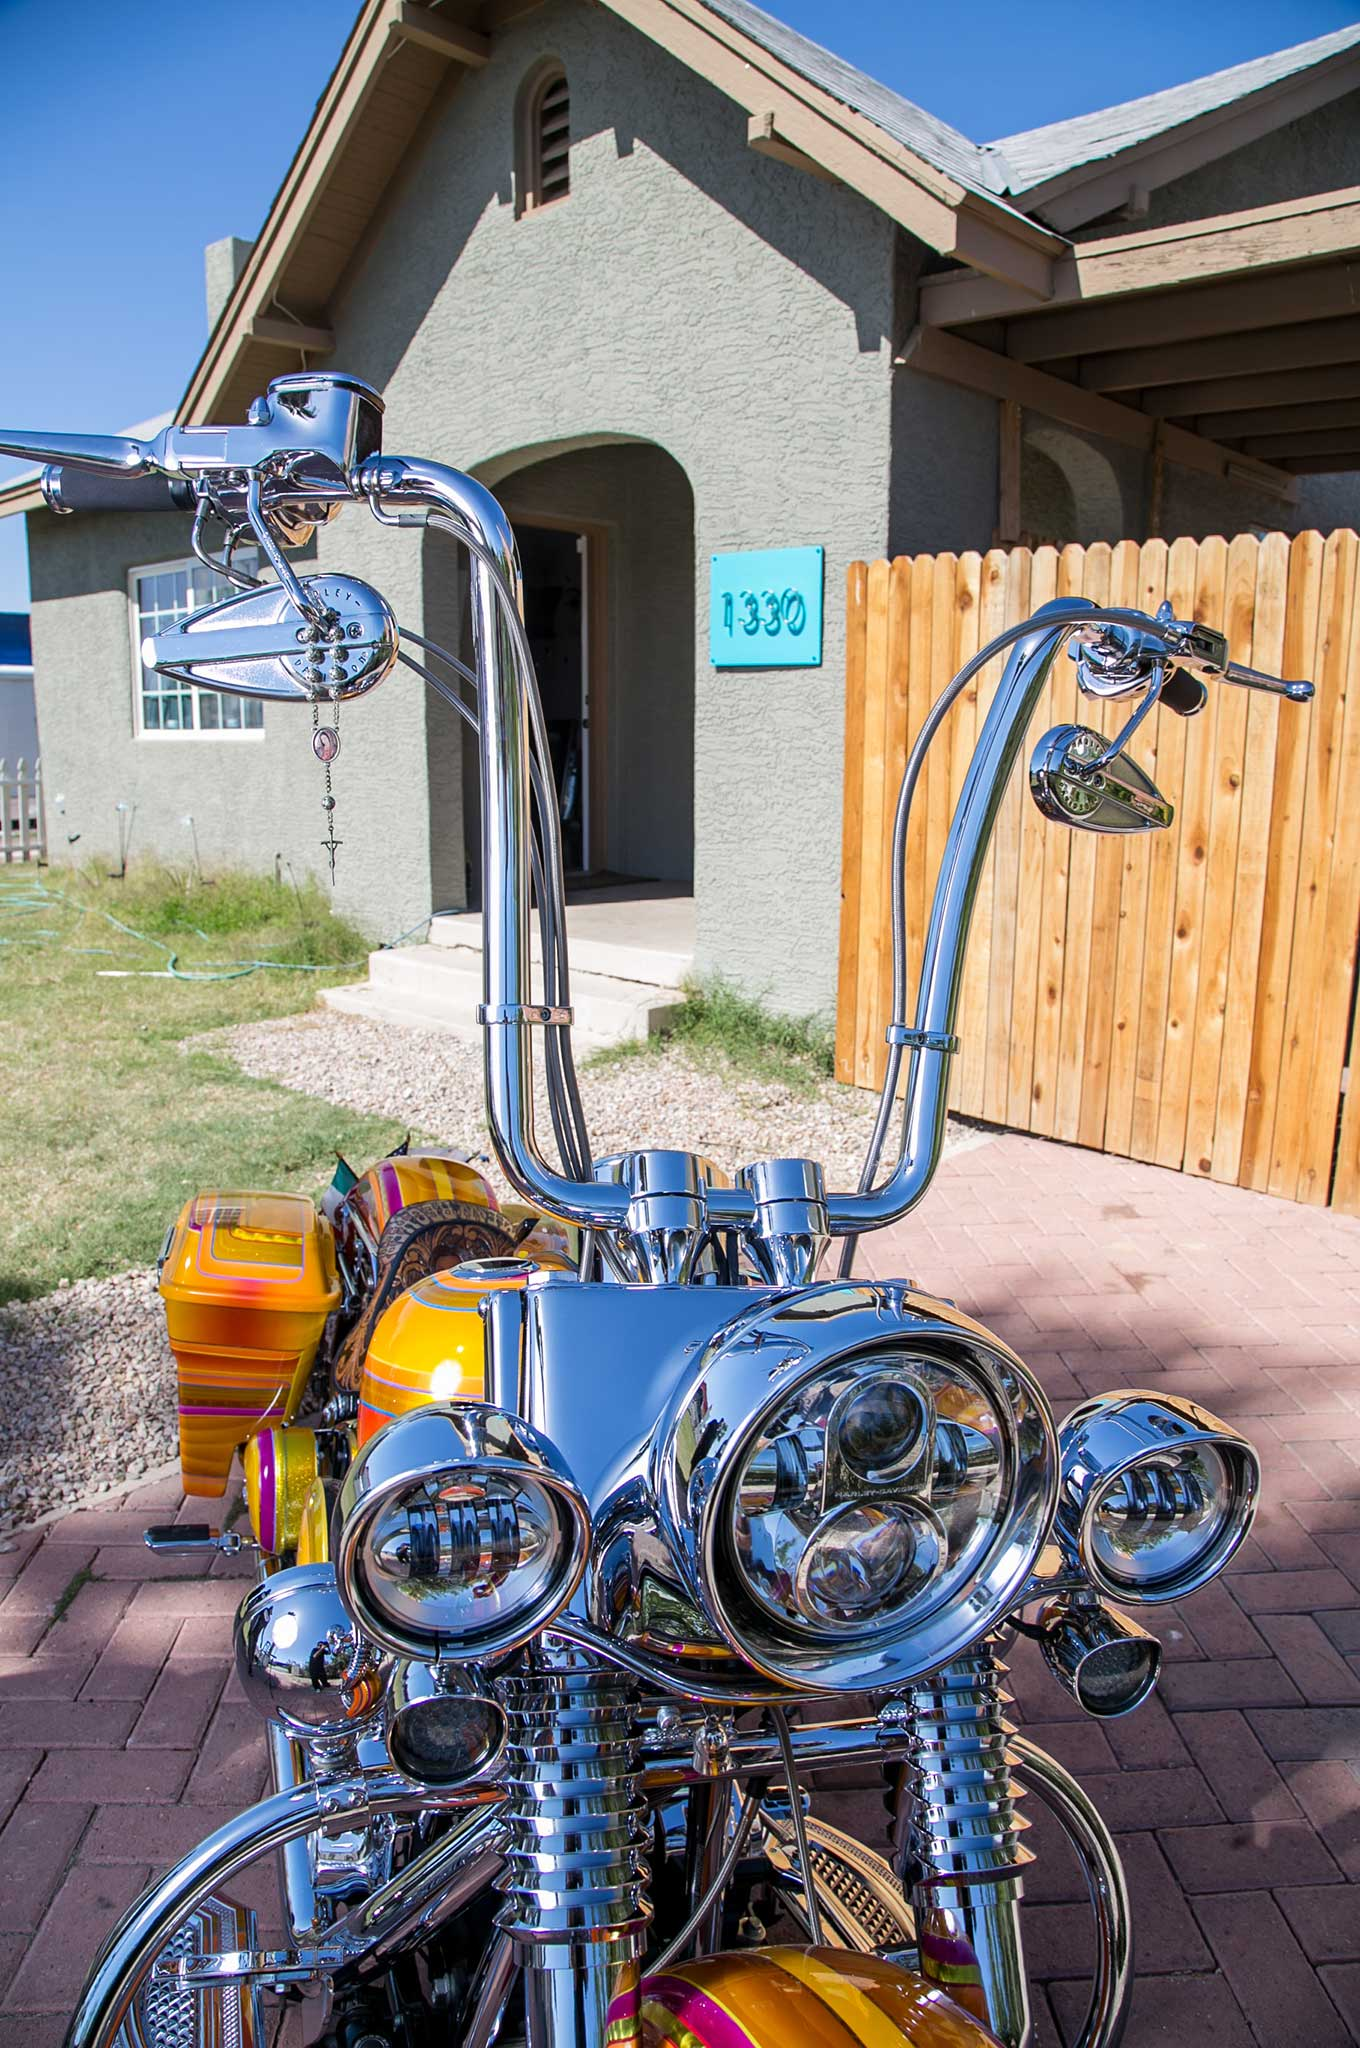 Harley Davidson Fat Boy Headlight